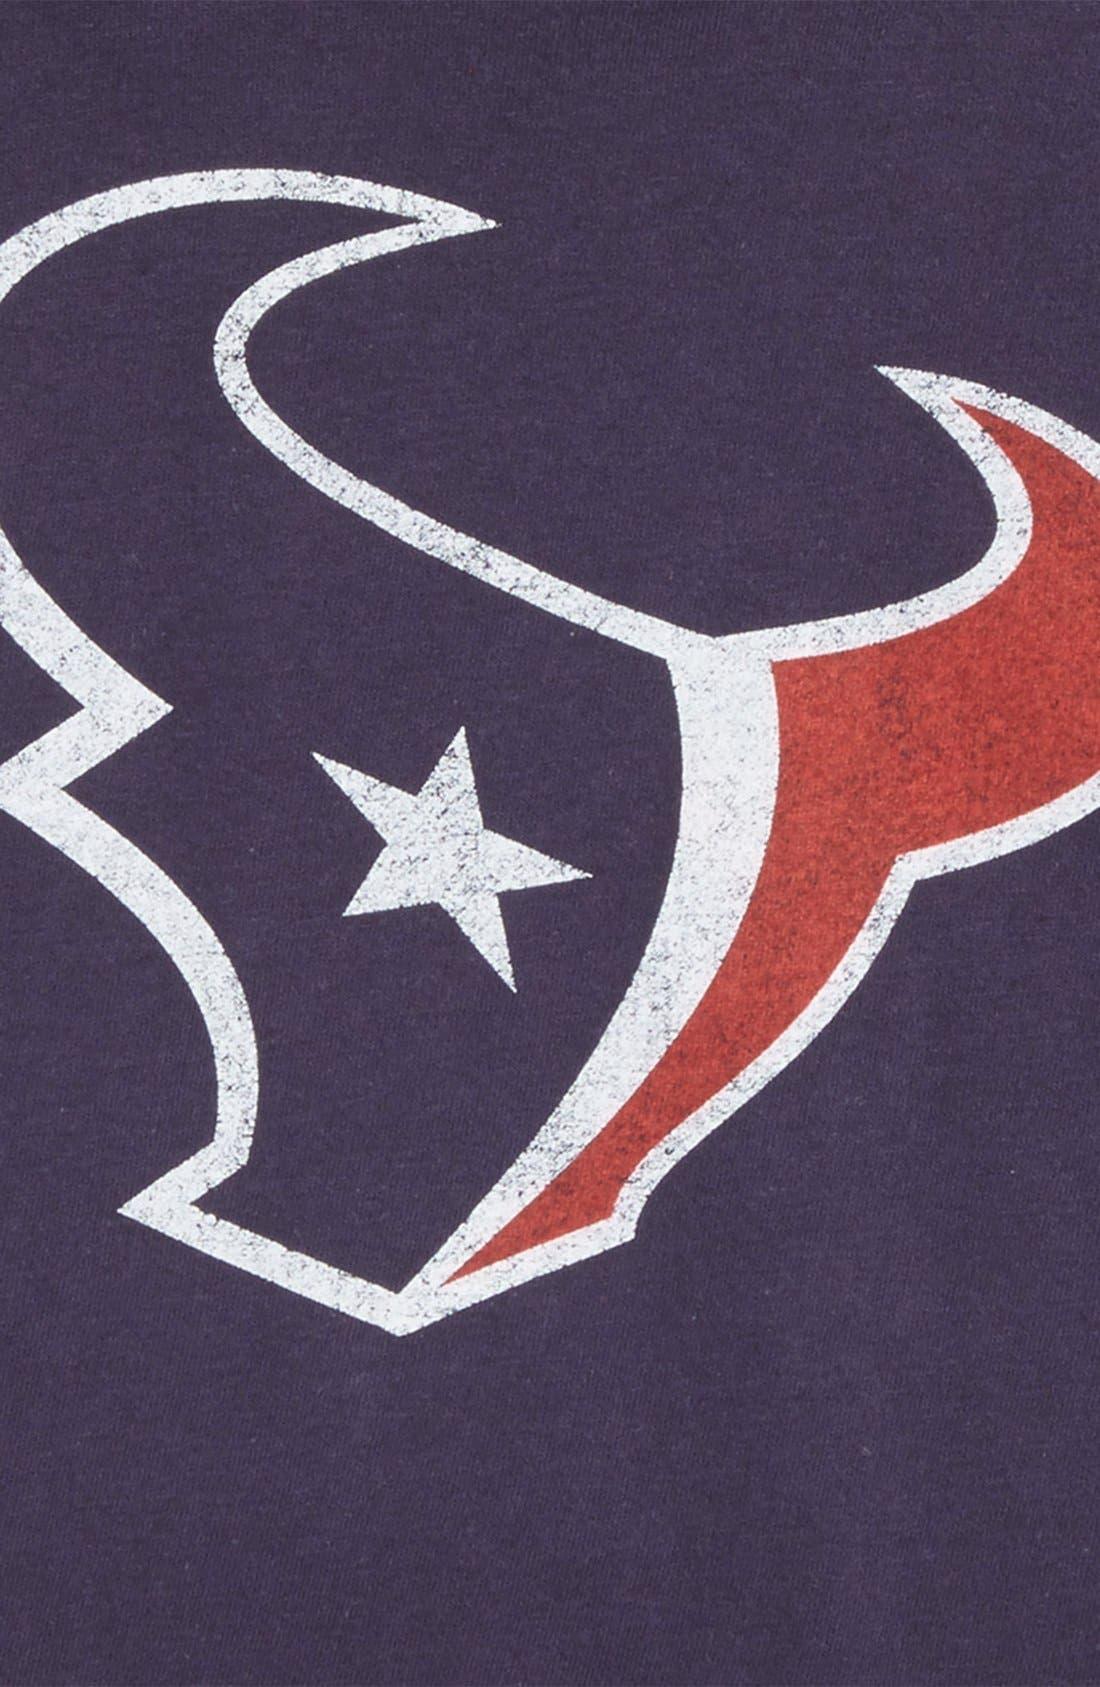 'NFL - Houston Texans' Distressed Logo Graphic T-Shirt,                             Alternate thumbnail 2, color,                             432